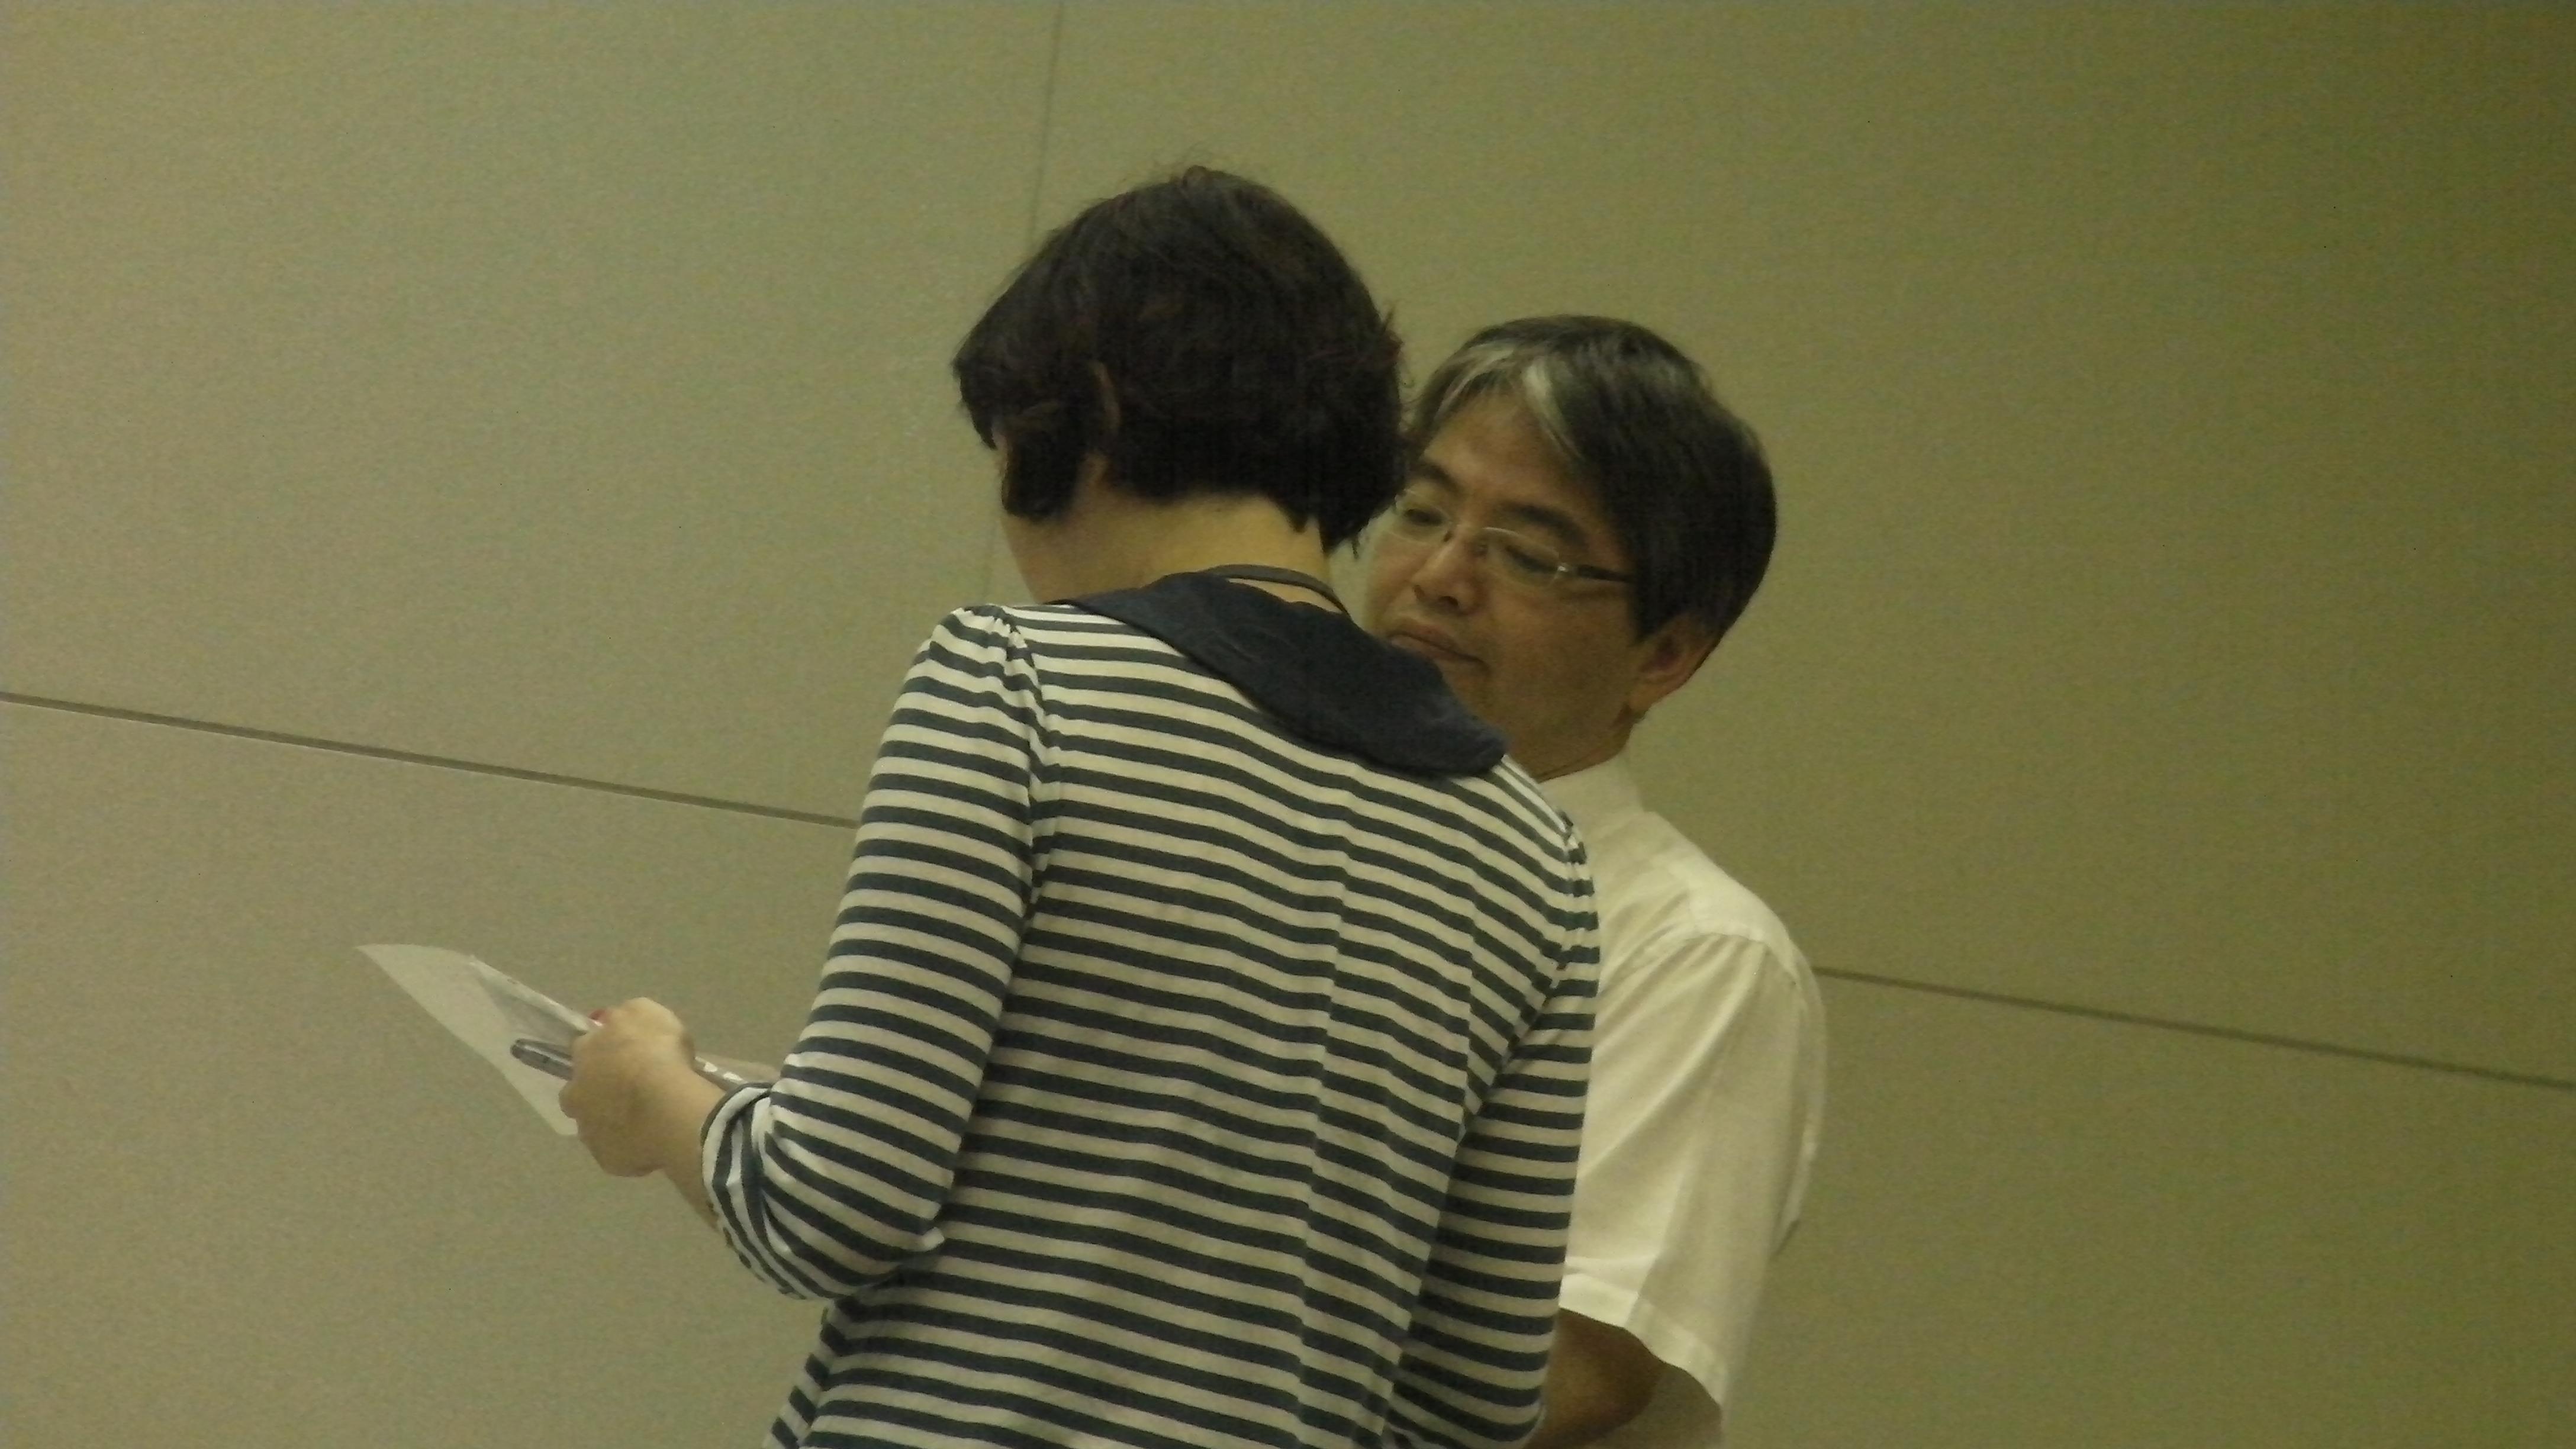 http://daily.magazine9.jp/m9/oshidori/SANY0547.JPG